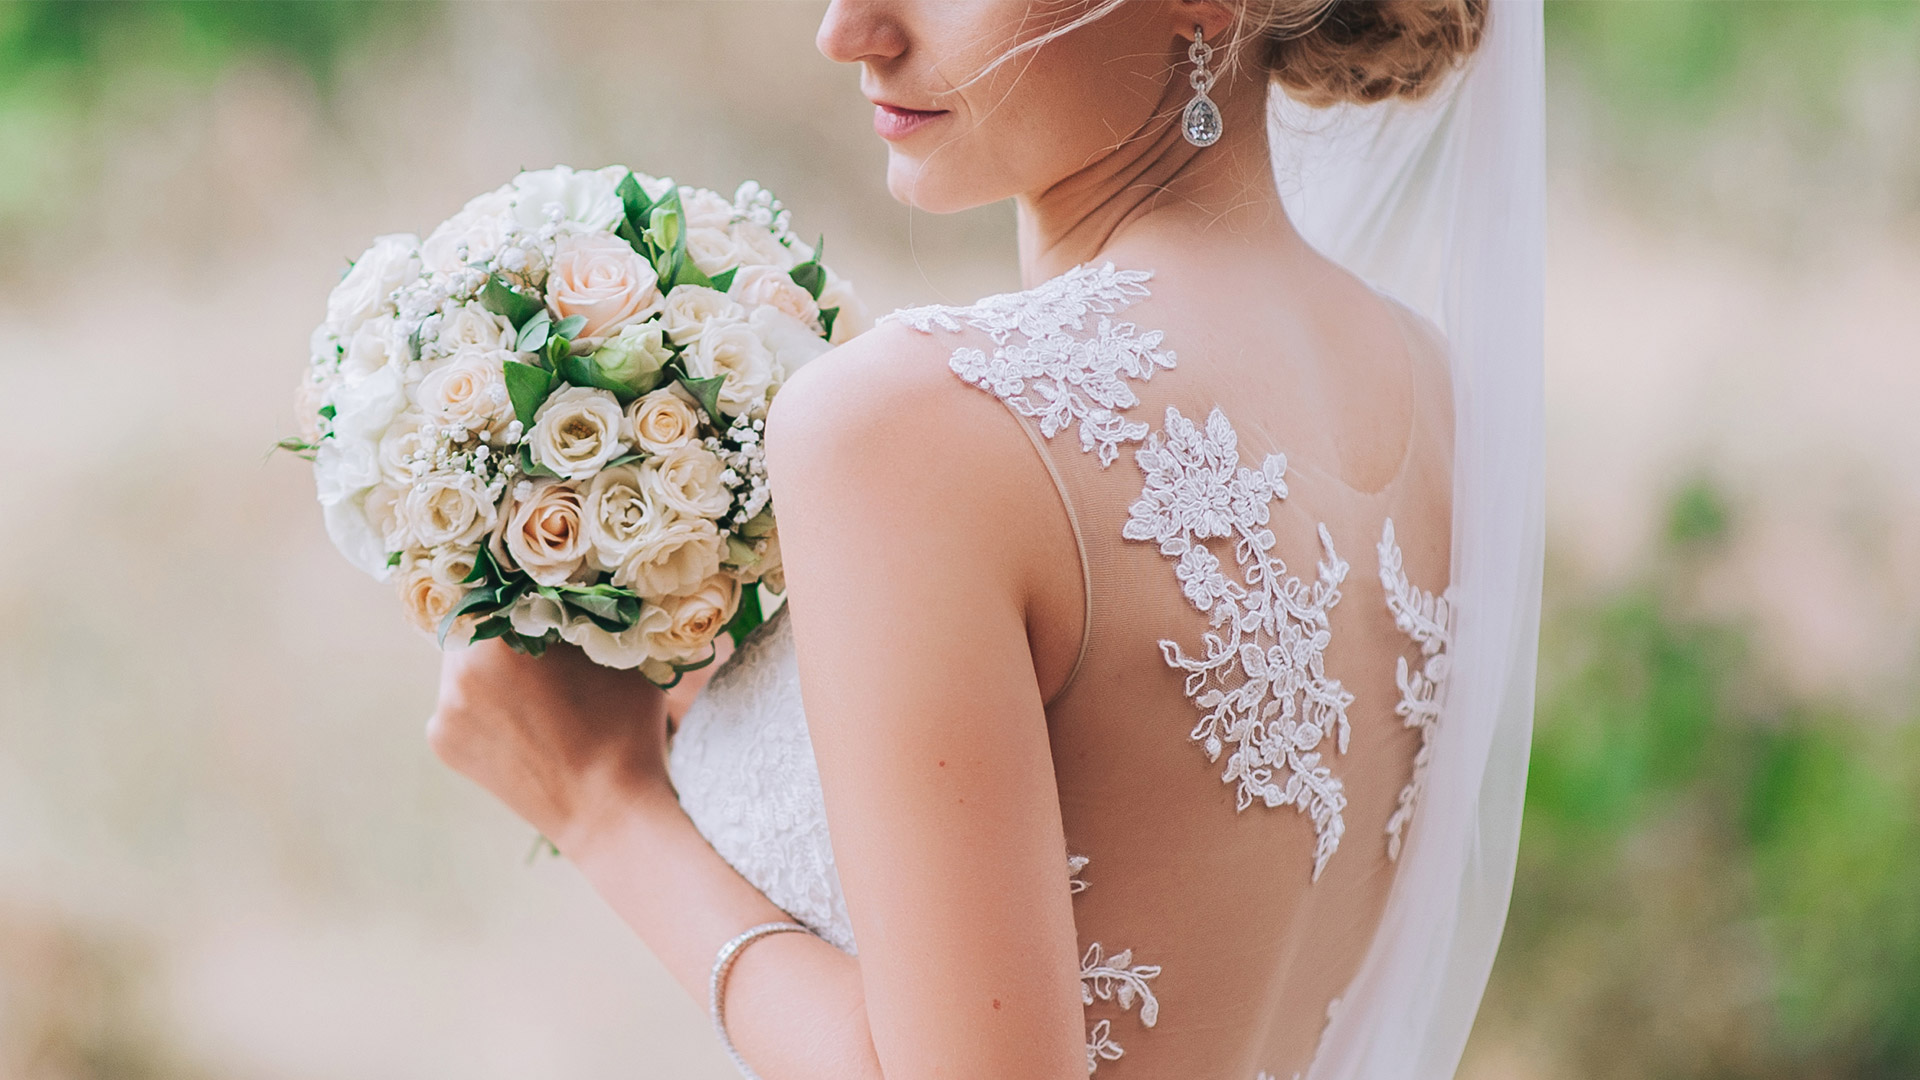 Bouquet of love in her heart